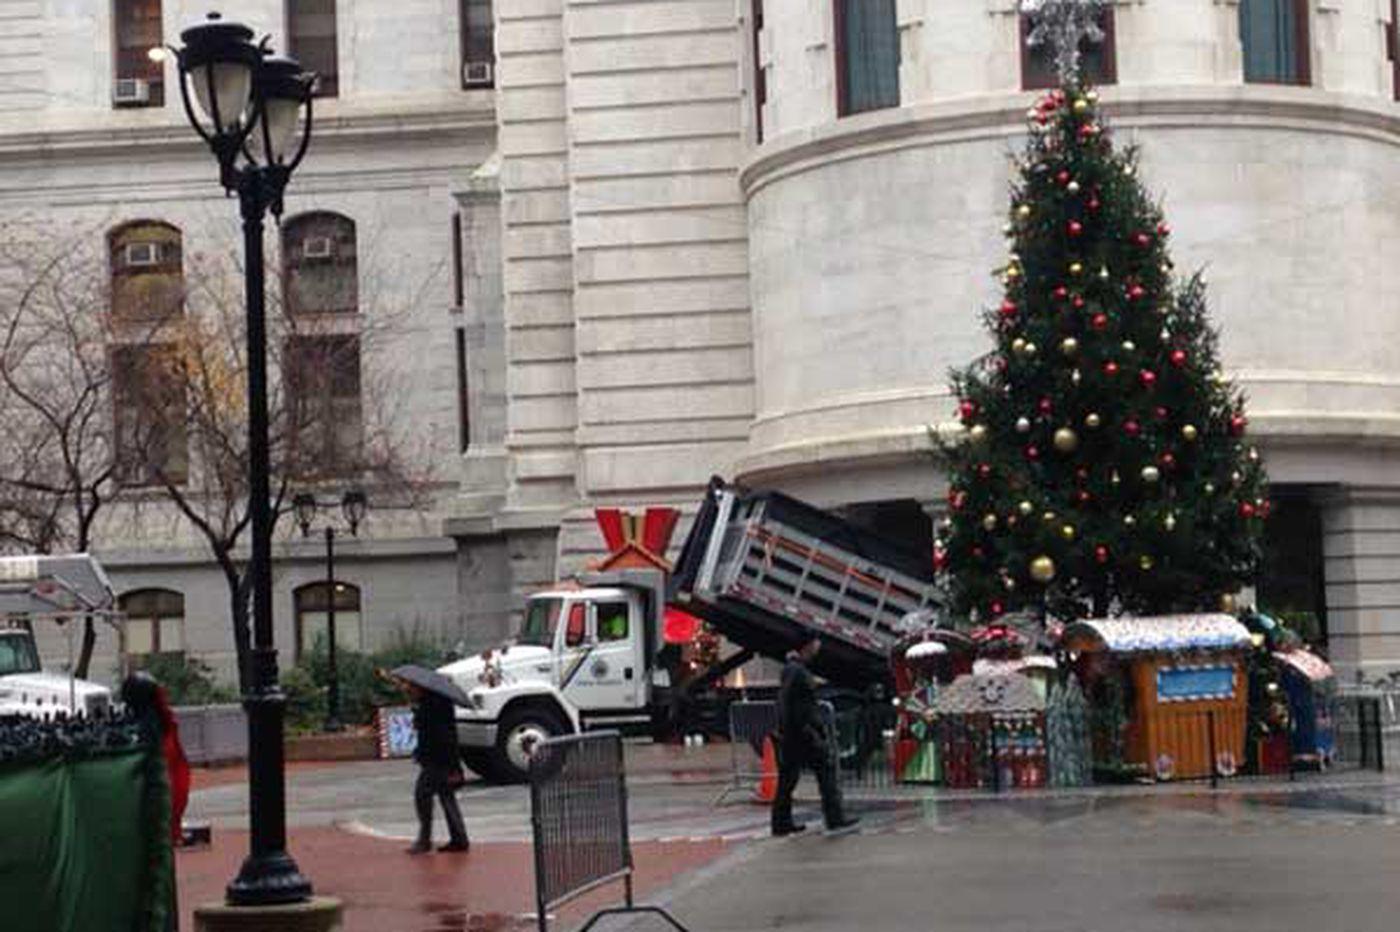 City Hall Christmas tree to be lit Wednesday night